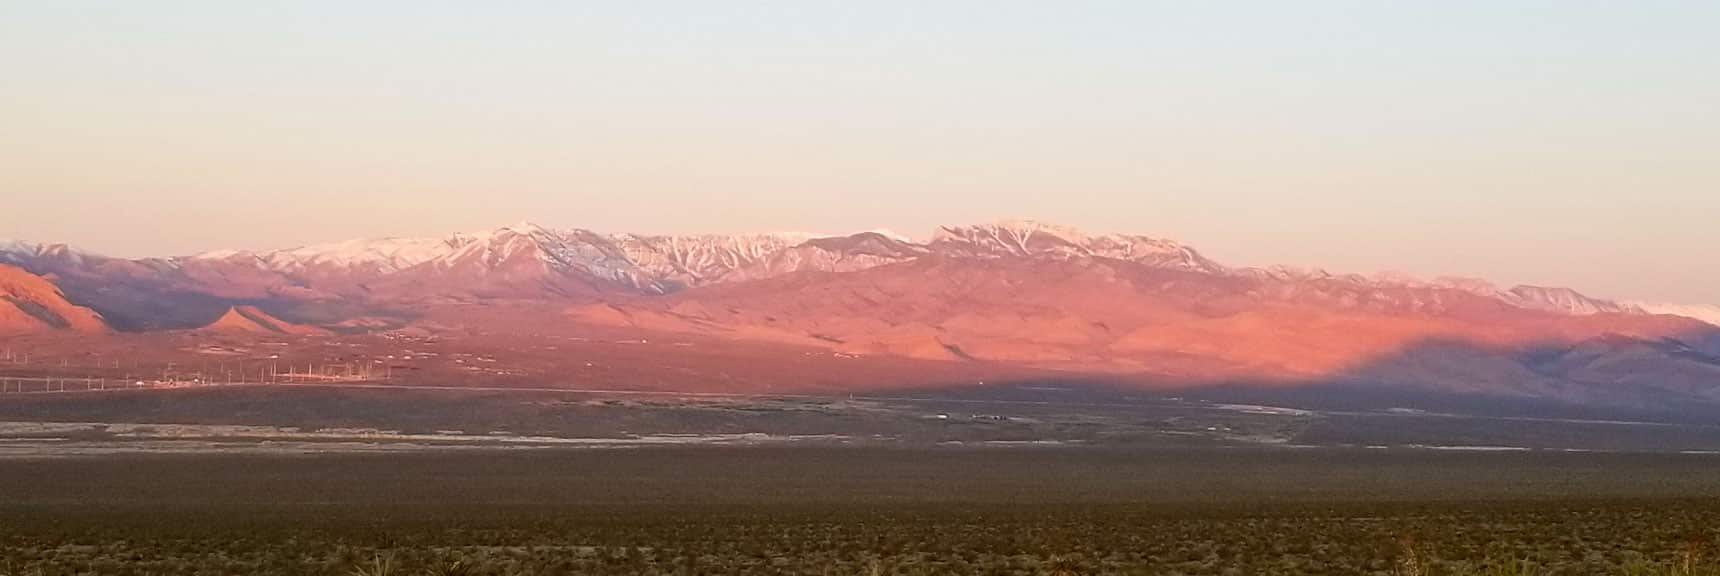 Sunrise View Toward Mt. Charleston Wilderness | Gass Peak Eastern Summit Ultra-marathon Adventure, Nevada